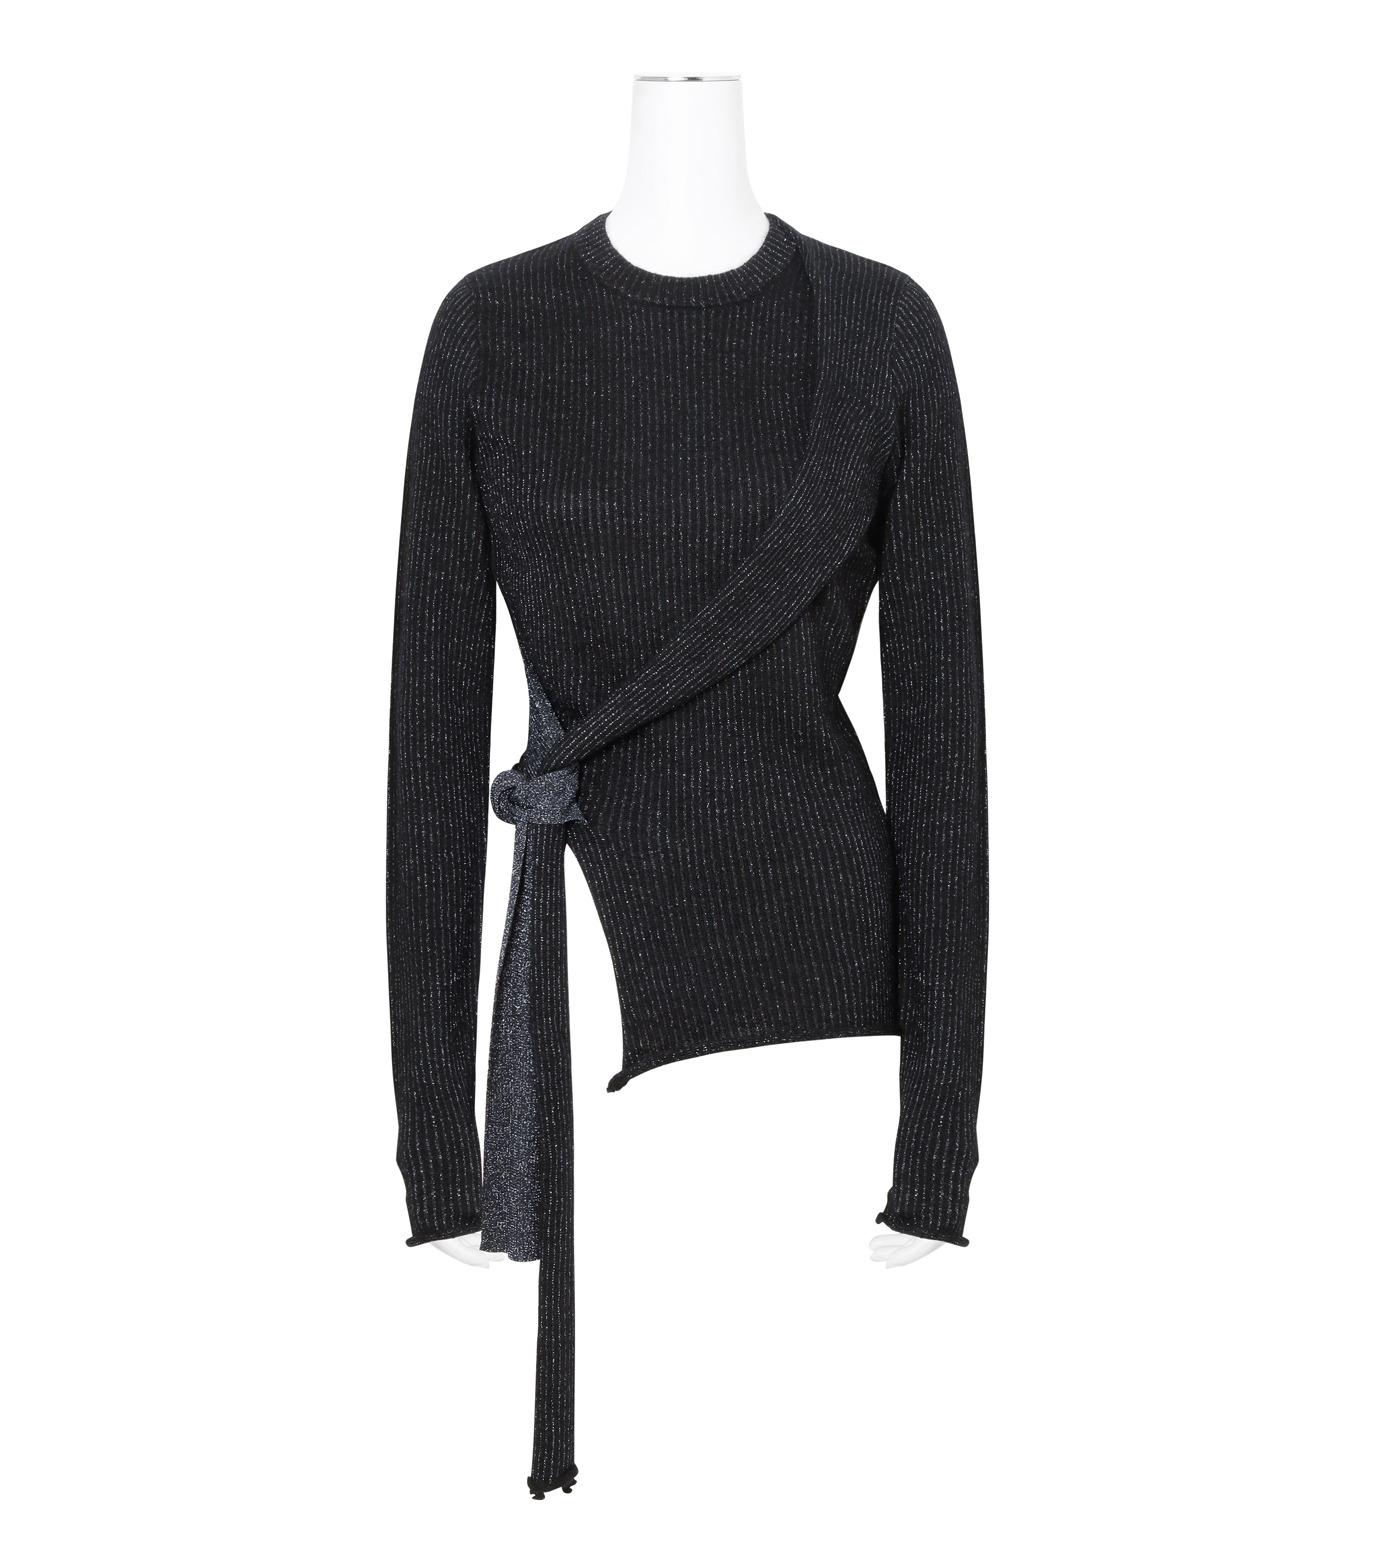 3.1 Phillip Lim(スリーワン フィリップリム)のLurex Tie Pullover-NAVY(ニット/knit)-H161-7745SLM-93 拡大詳細画像1